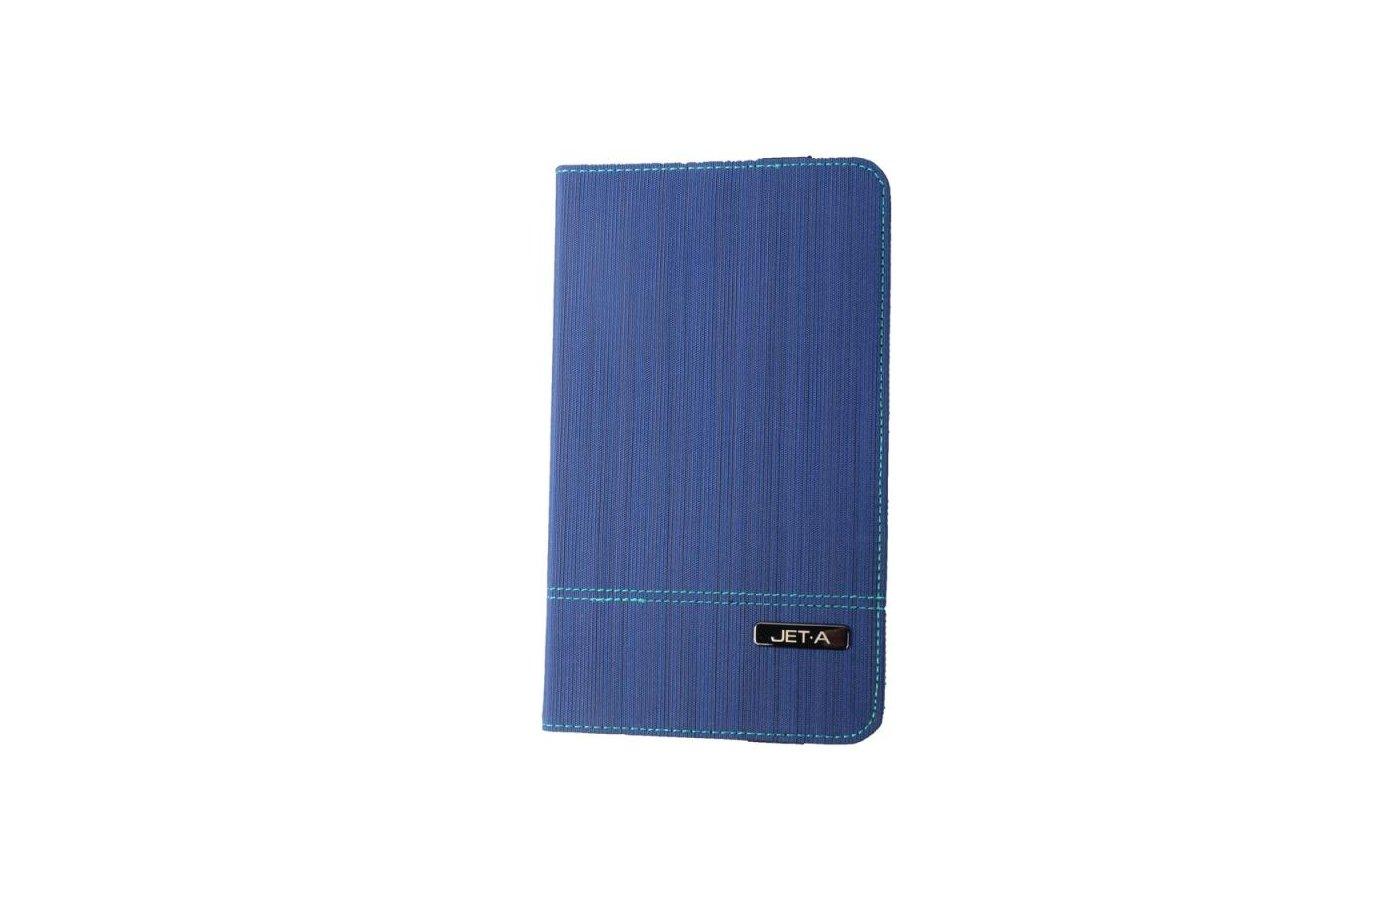 Чехол для планшетного ПК Jet.A SC8-7 для Samsung GT4 8 Цвет - Синий